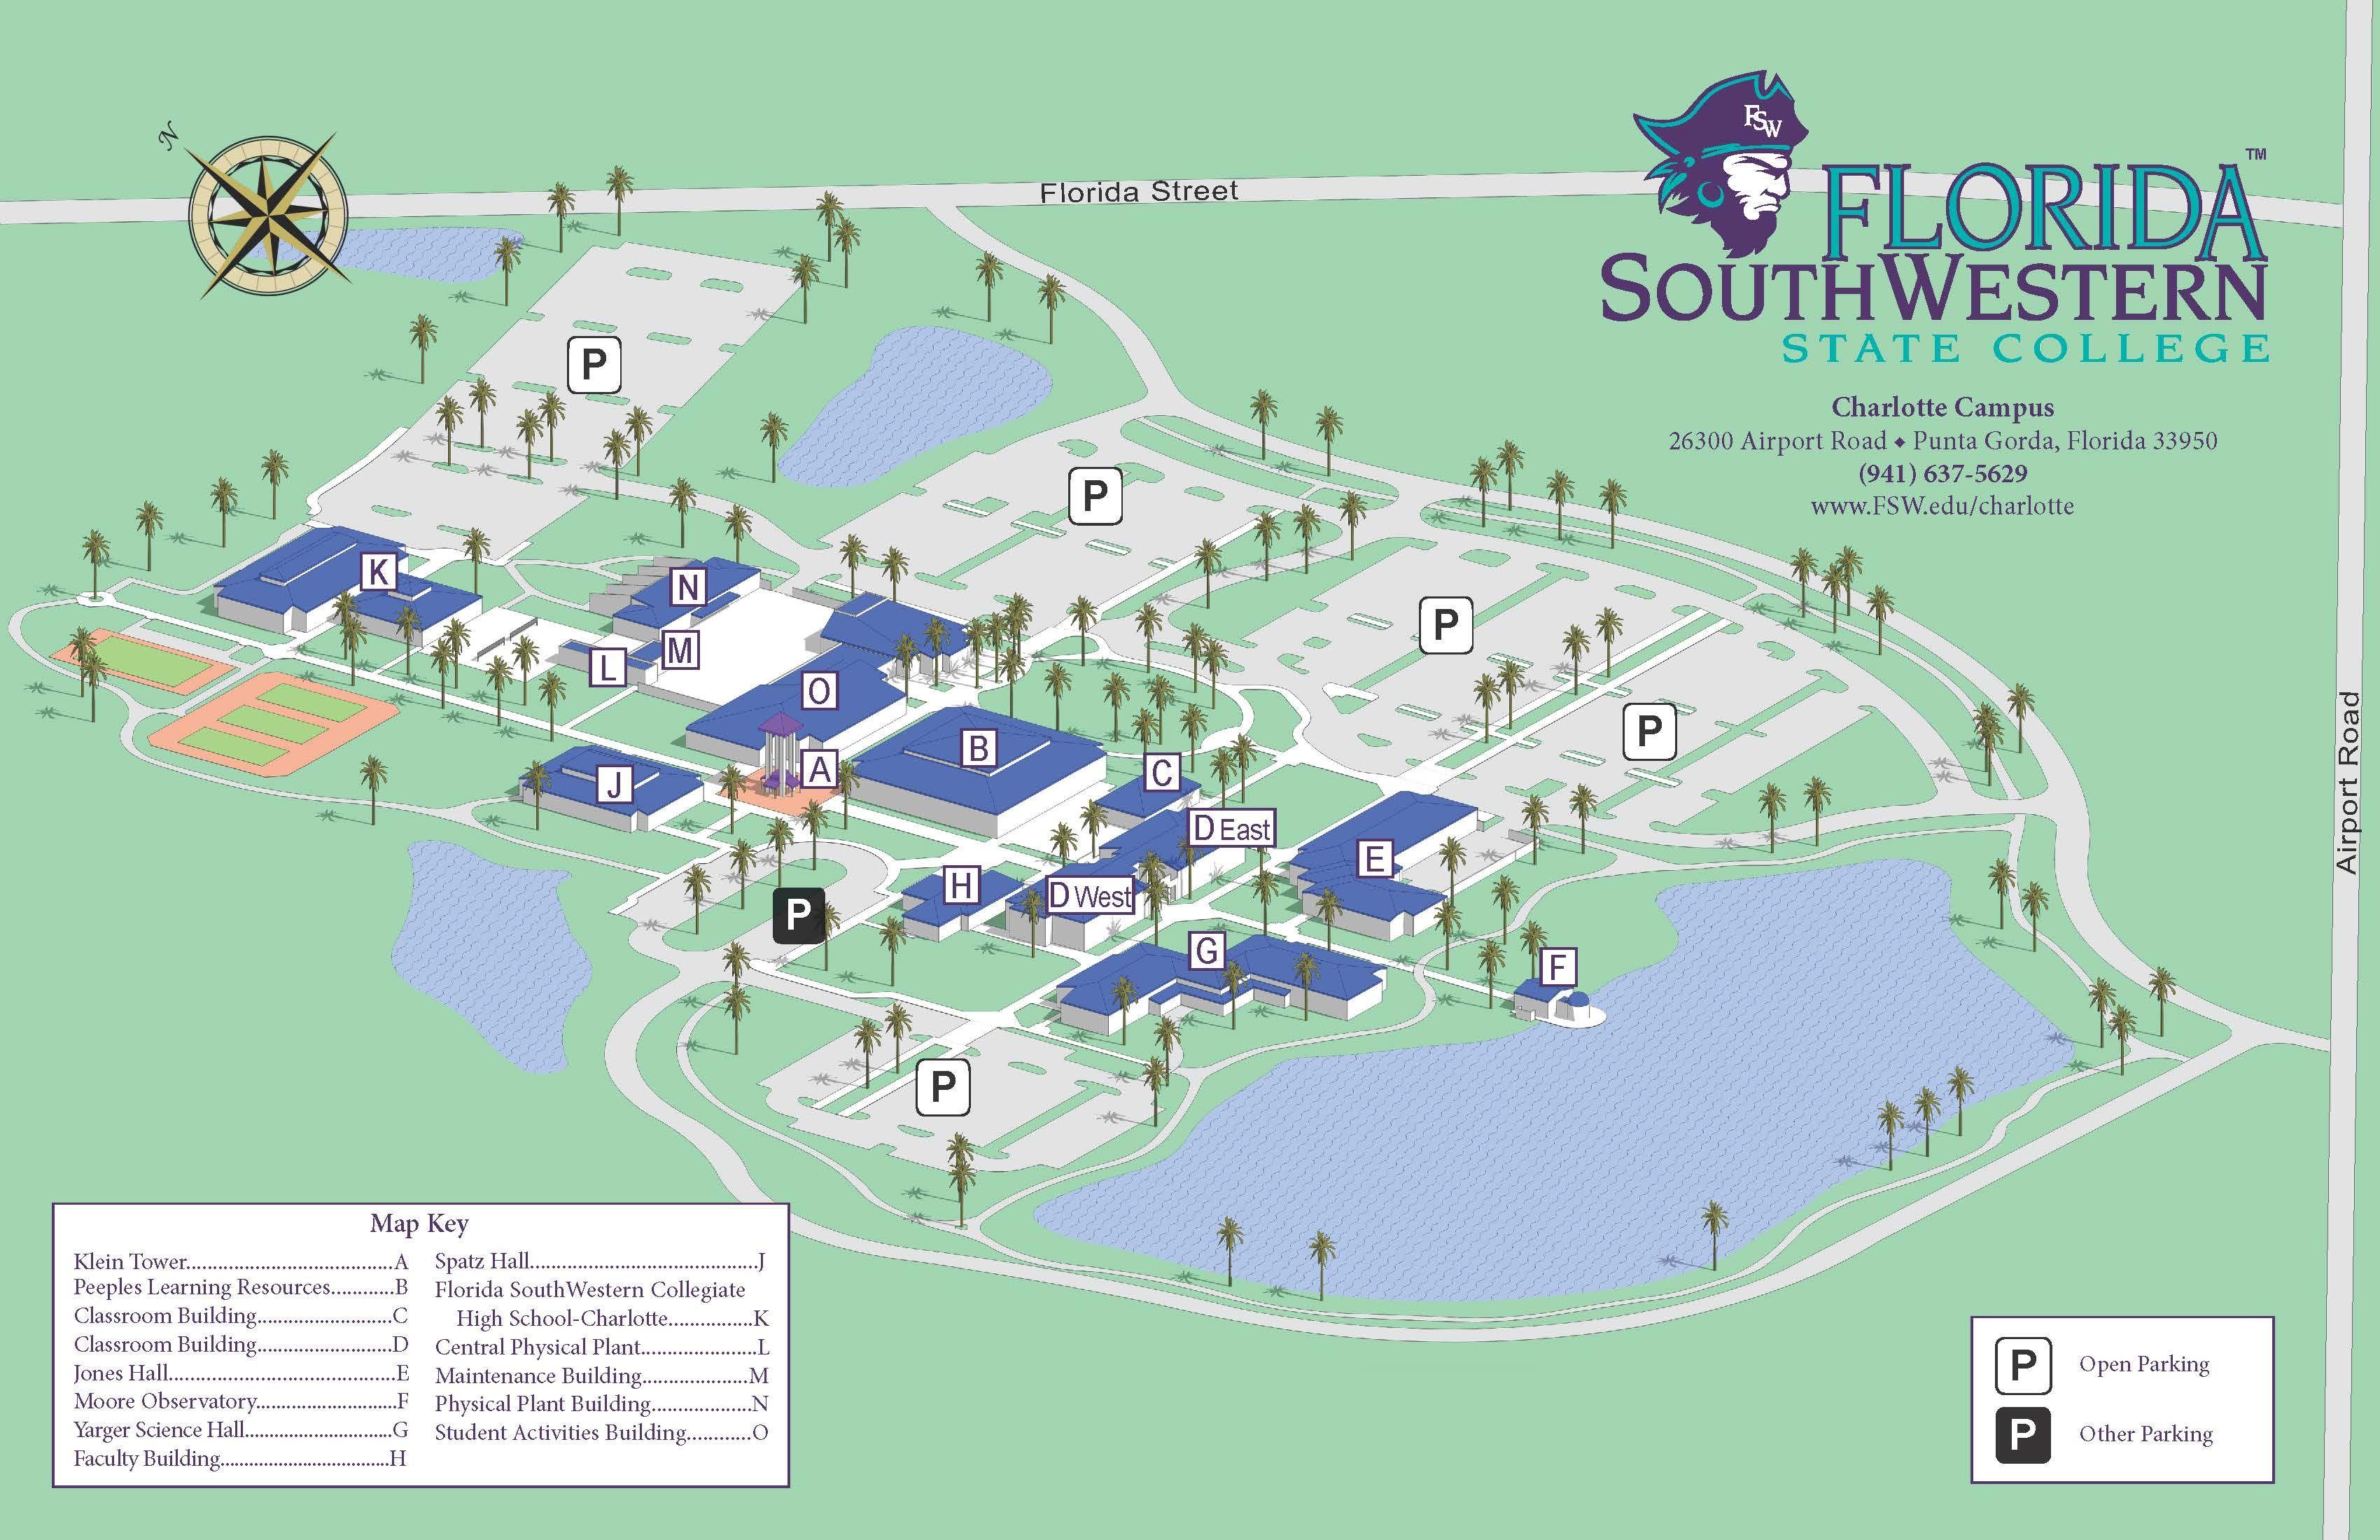 Florida Southwestern State College Bucsatwork Profile Pinterest